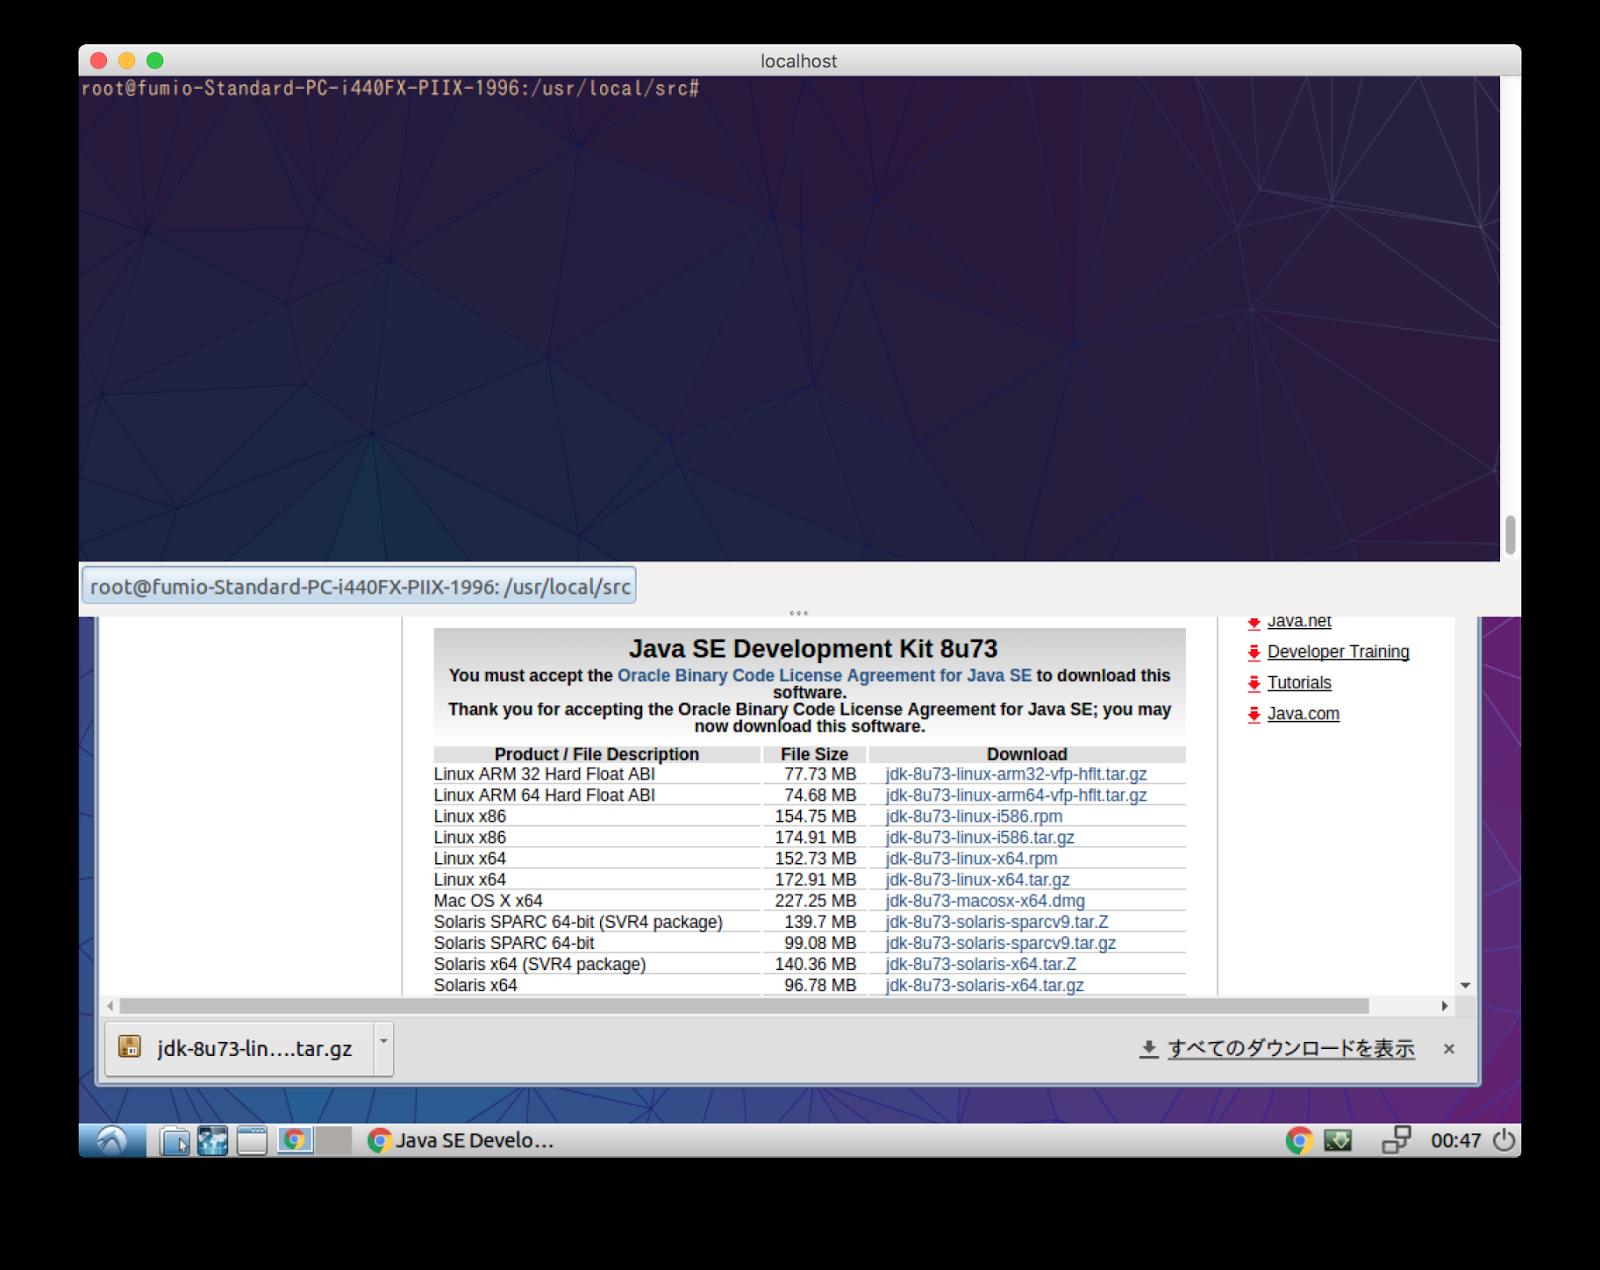 nagios-plugins v1.4.13